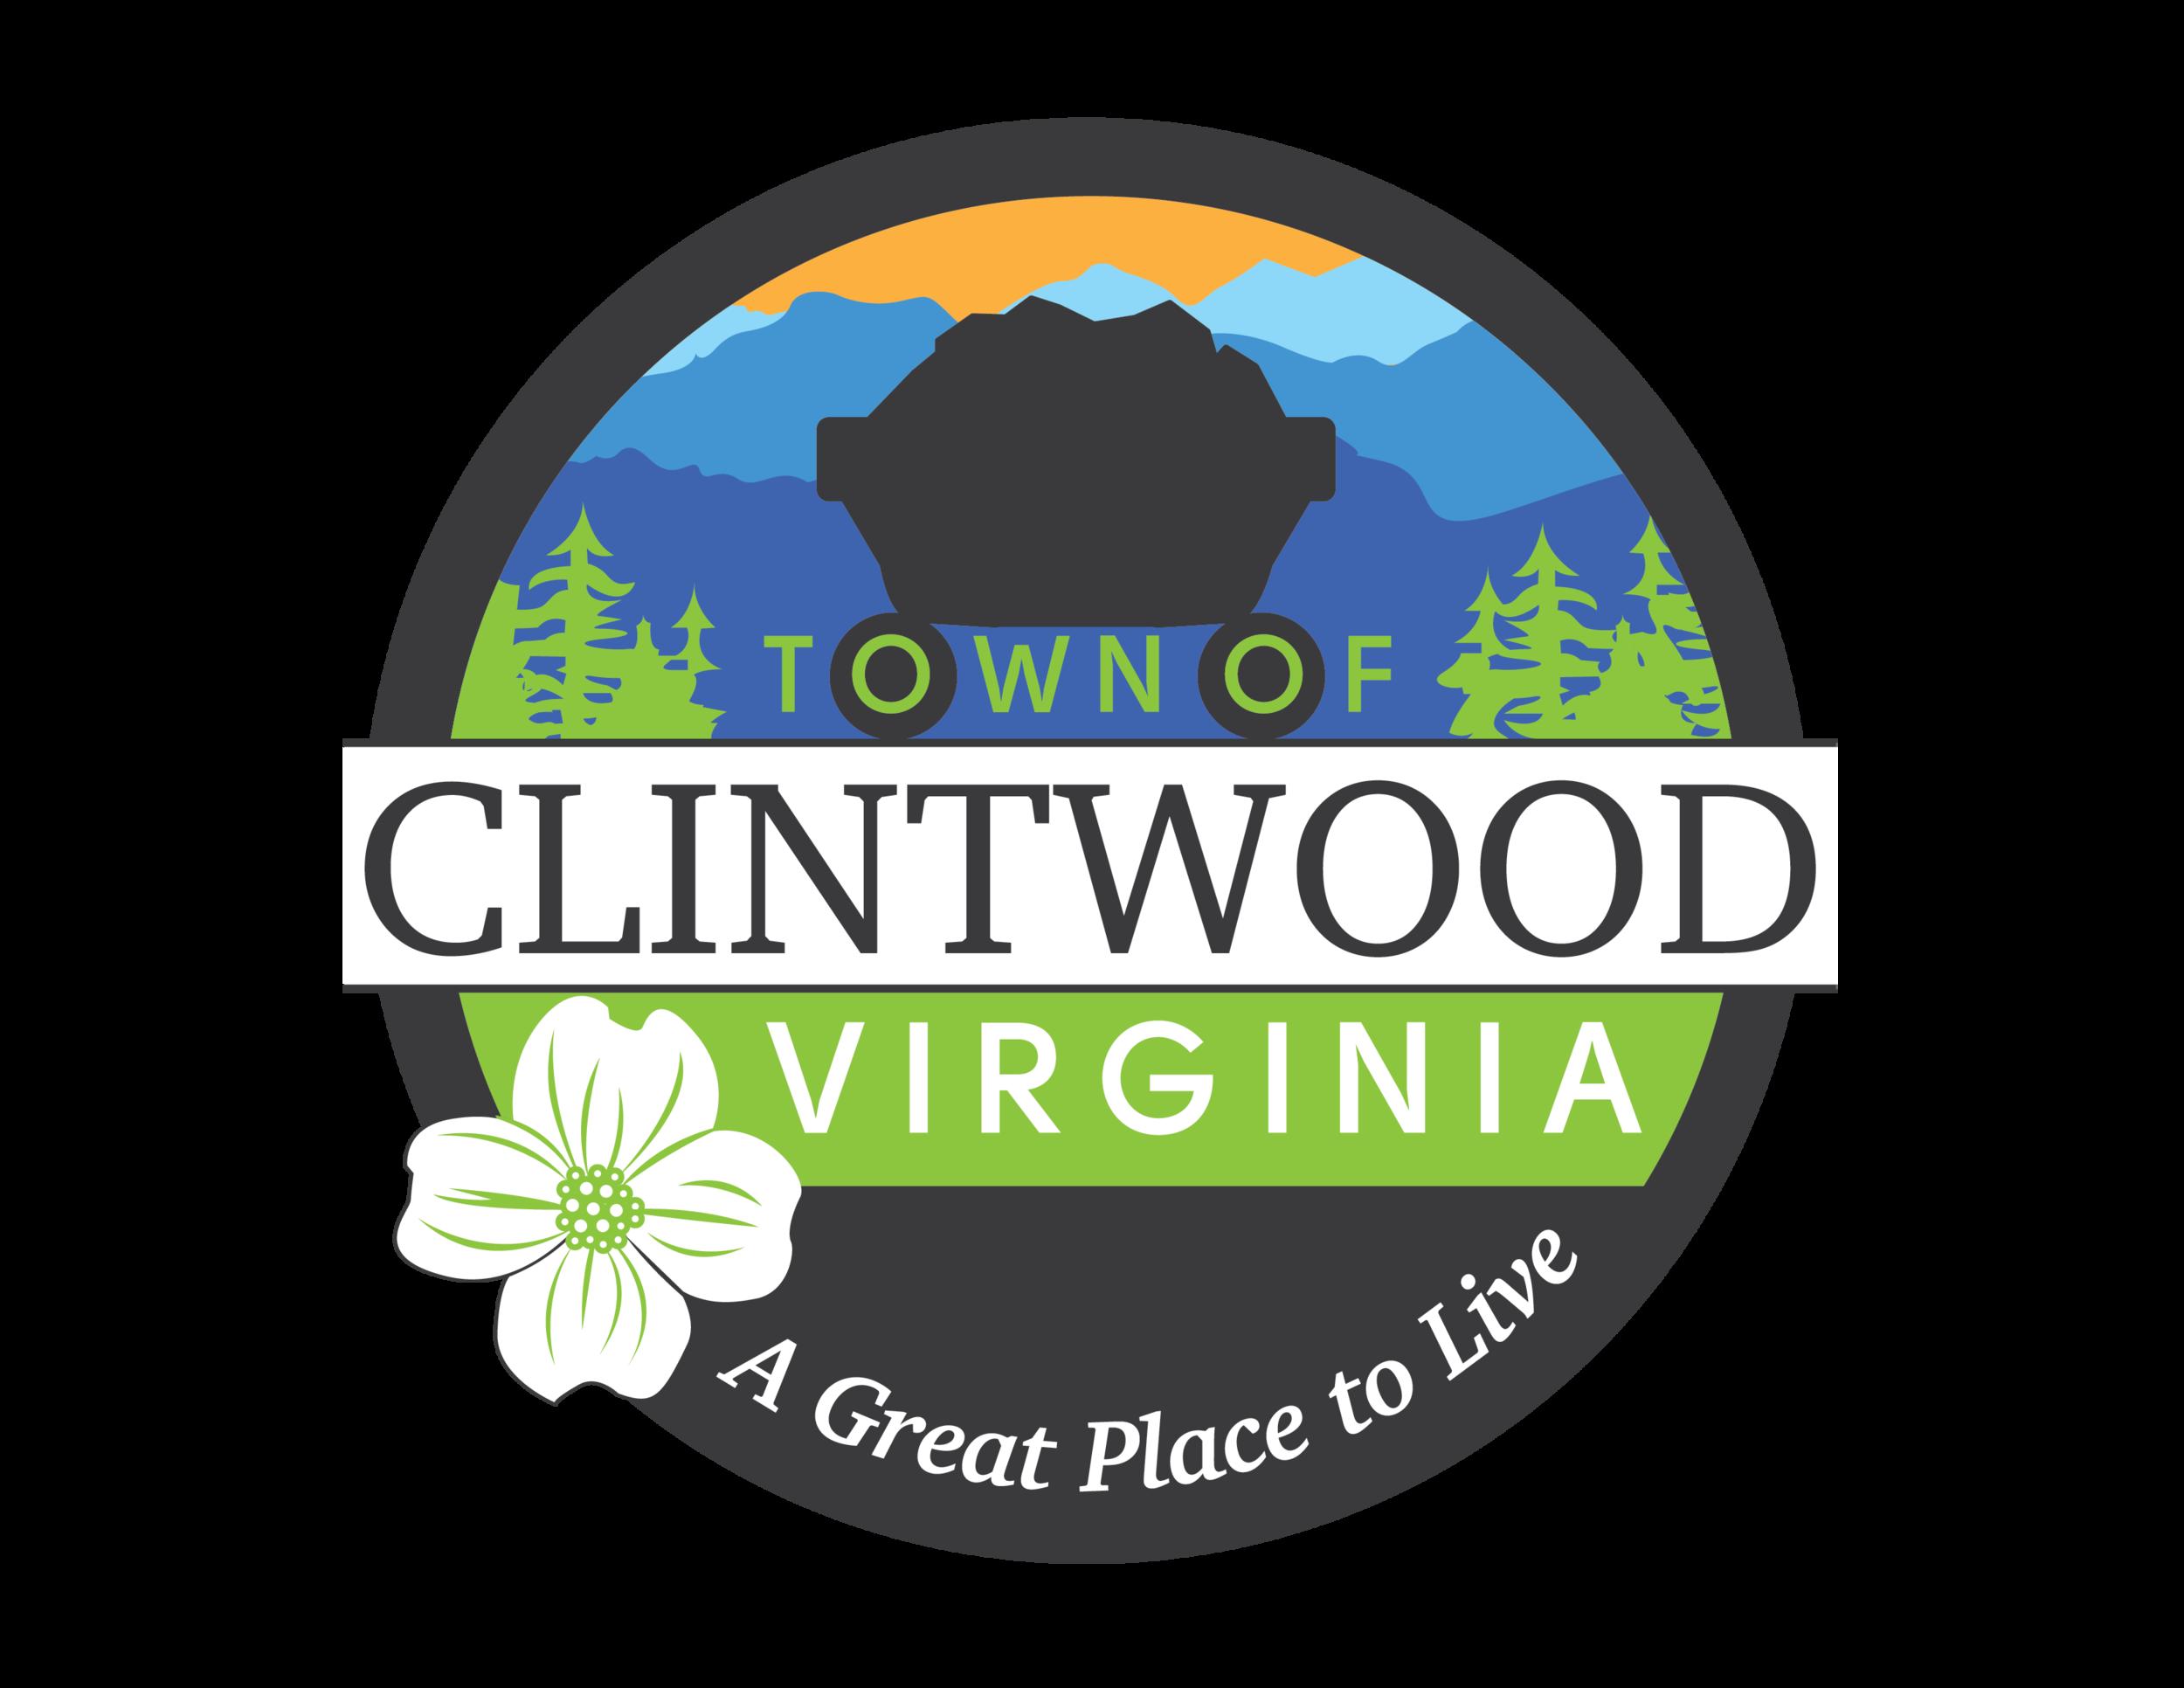 ClintwoodLogoNew3_7.png